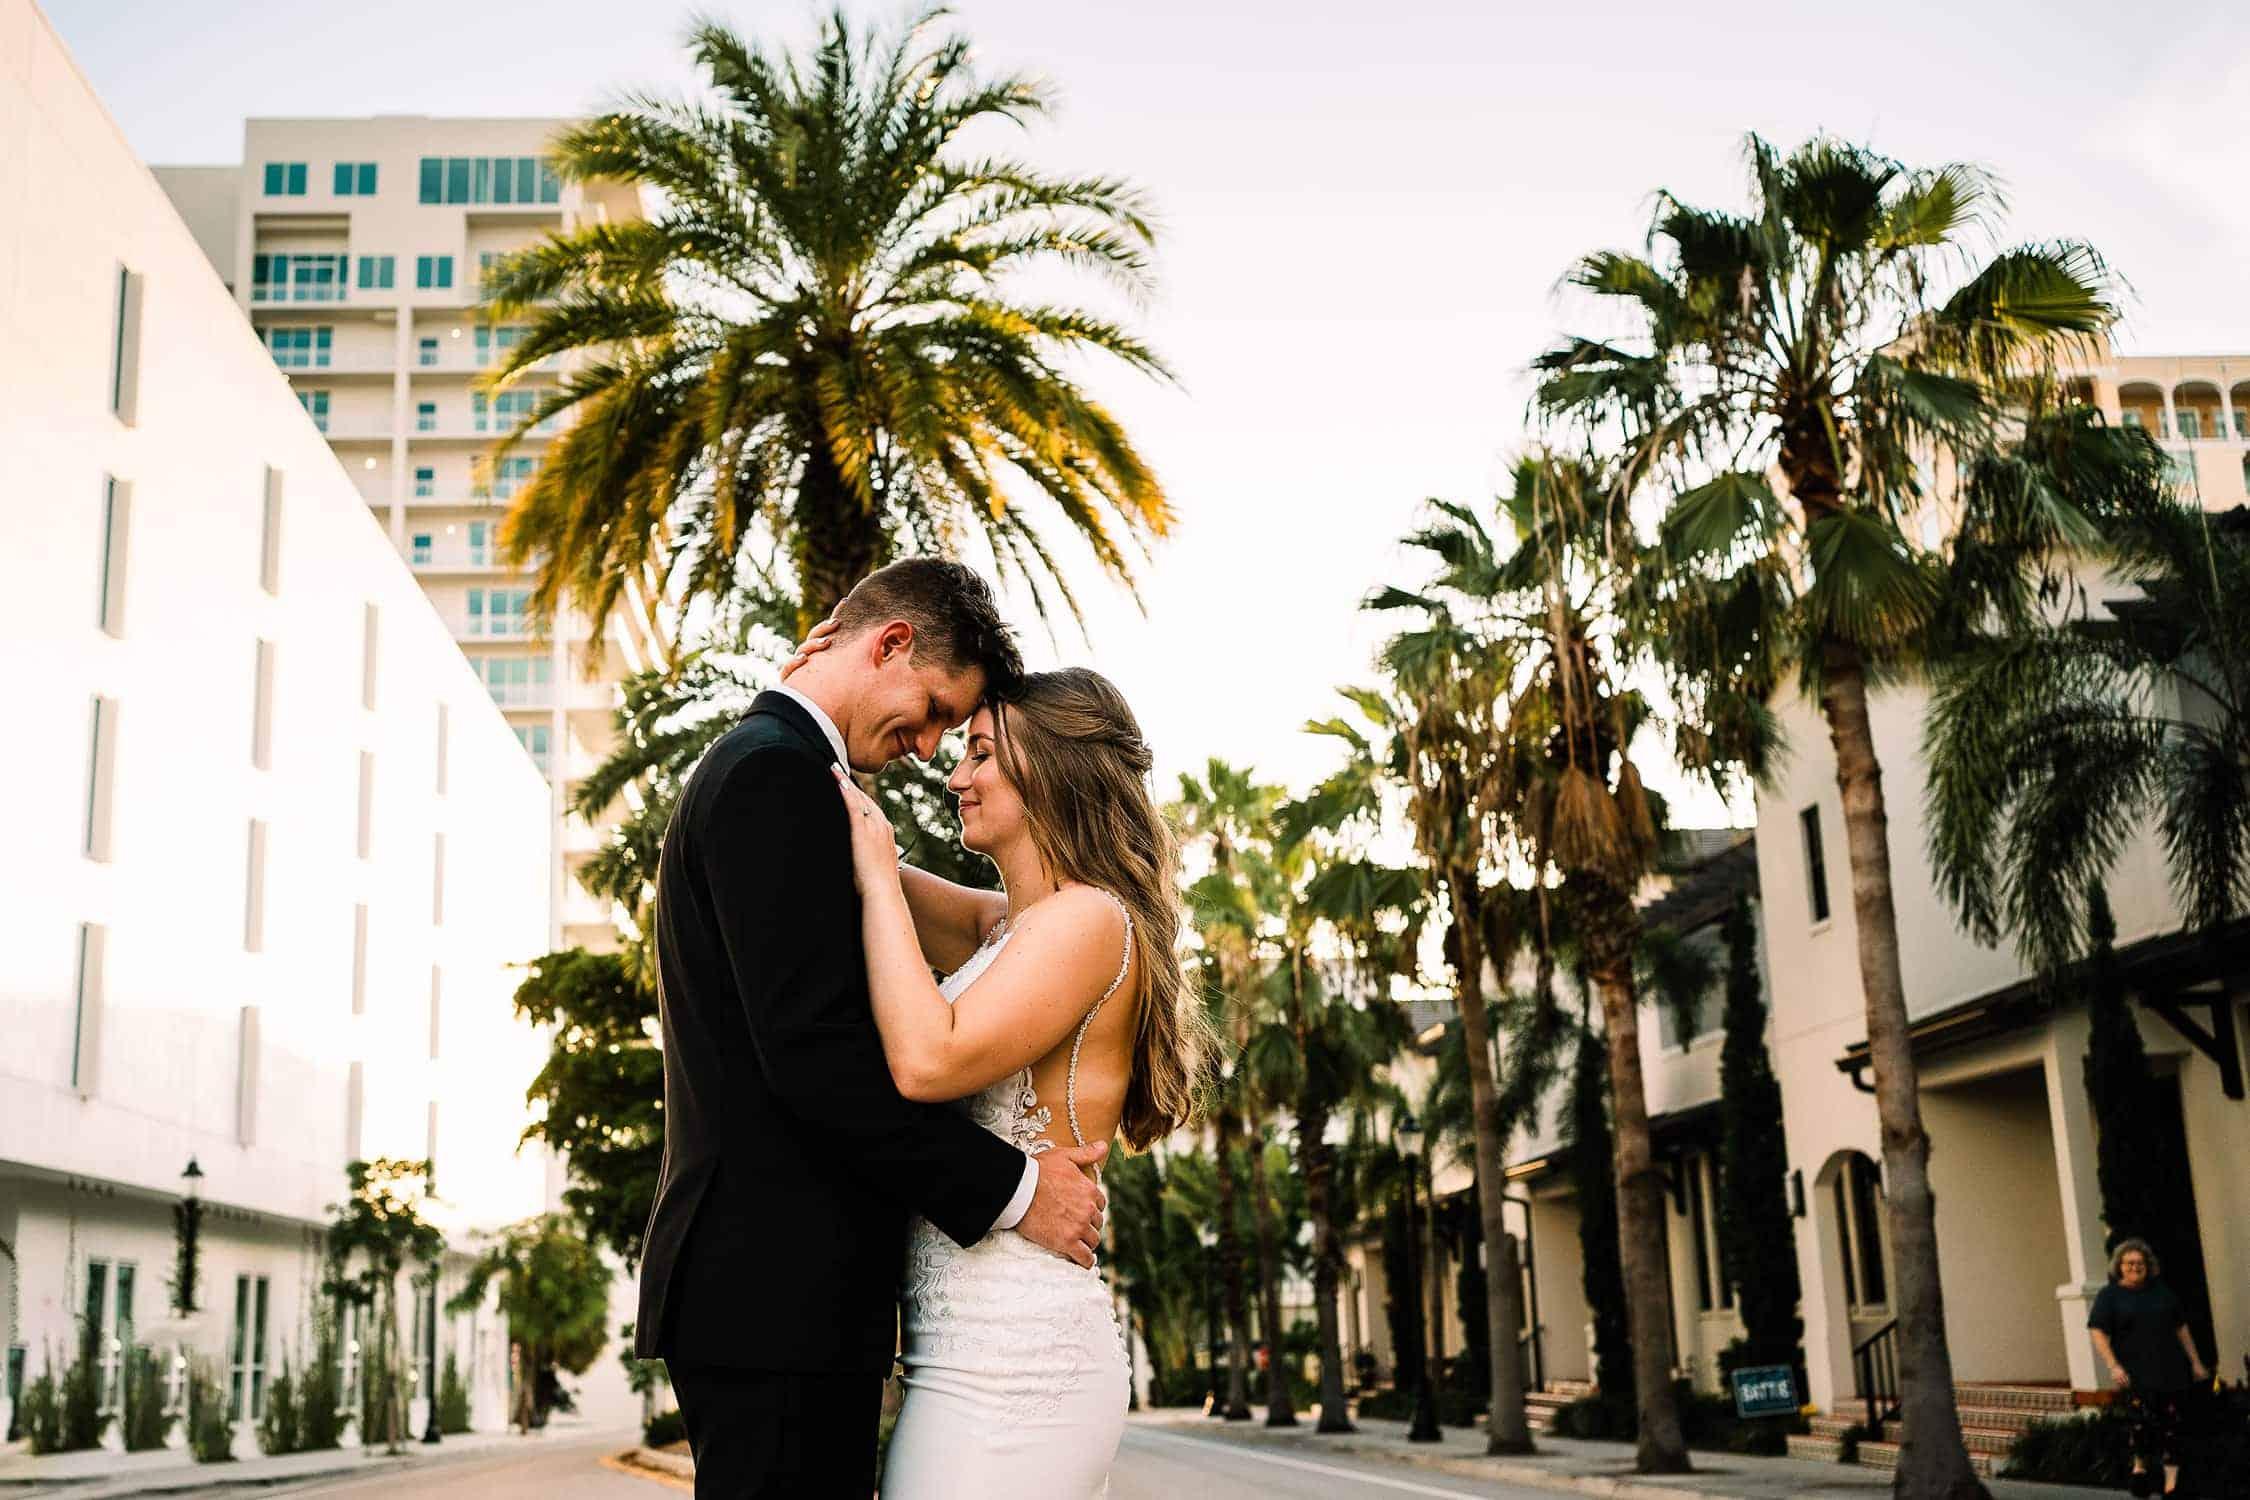 Couple hugging at a wedding in the Sarasota Modern by Sarasota wedding photographer